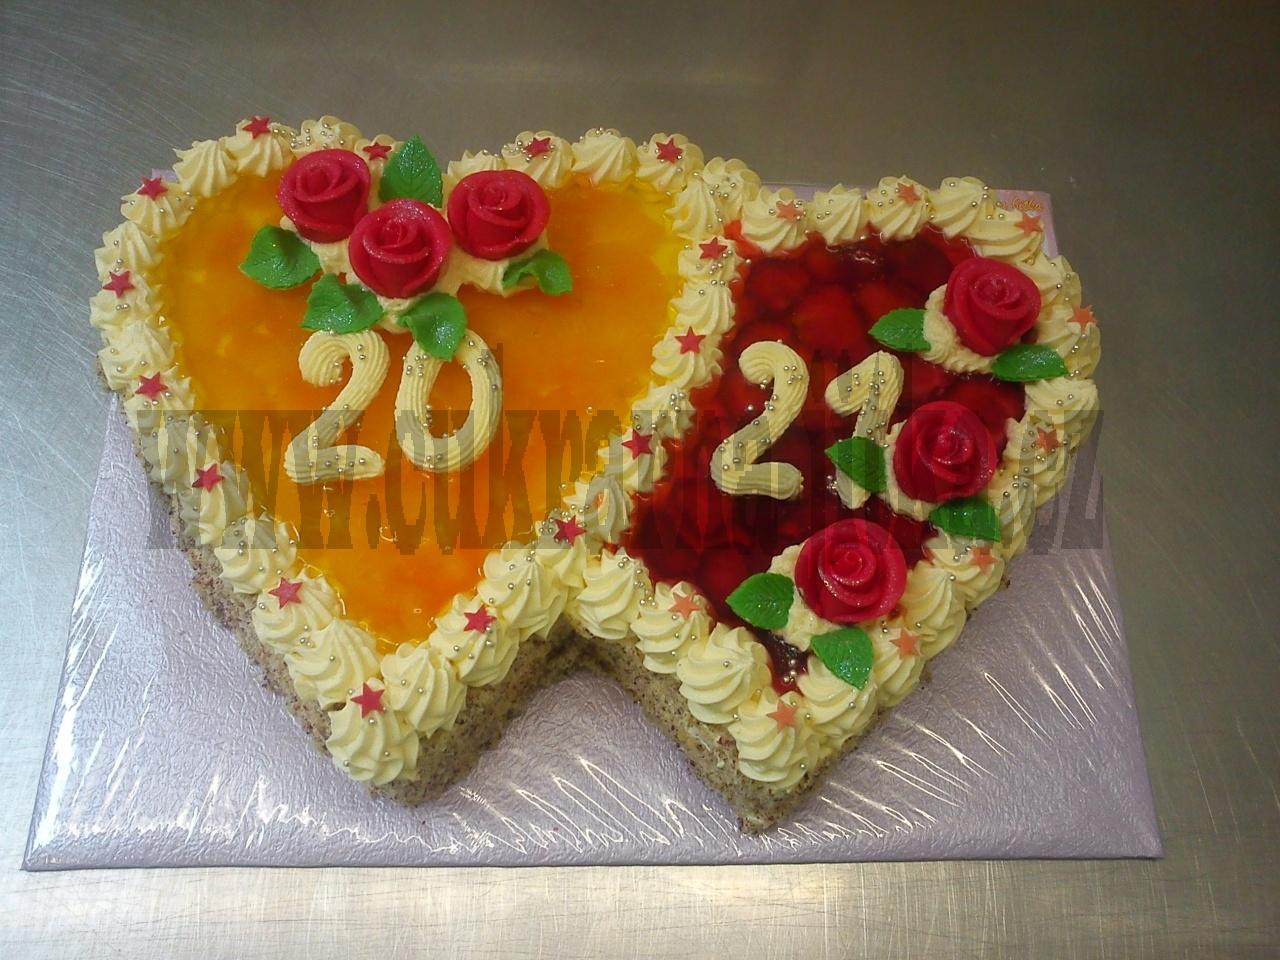 dvojsrdce dort mandarinky,jahody ,želatina   č.488